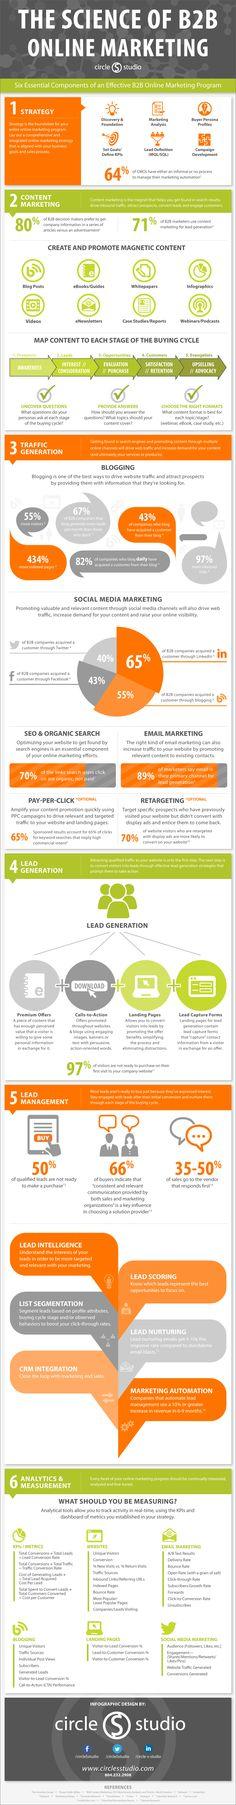 #infographie #webmarketing #b2b